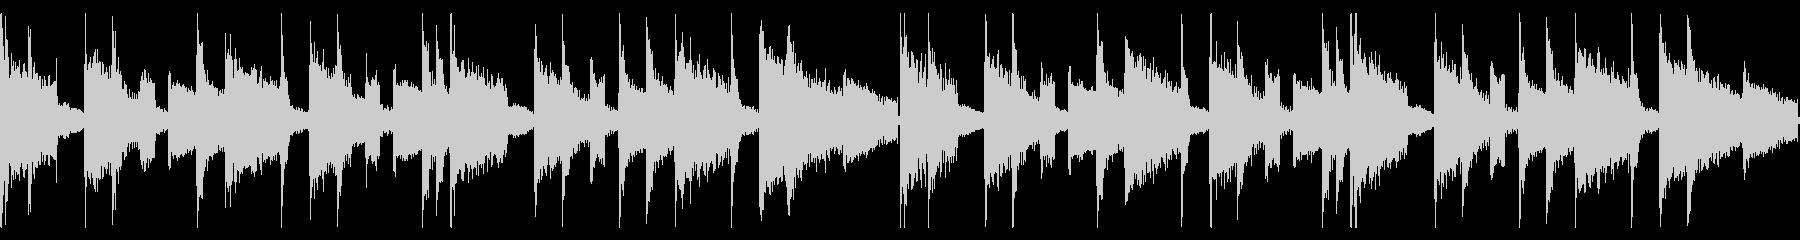 Instrumental loop with an impressive piano loop's unreproduced waveform